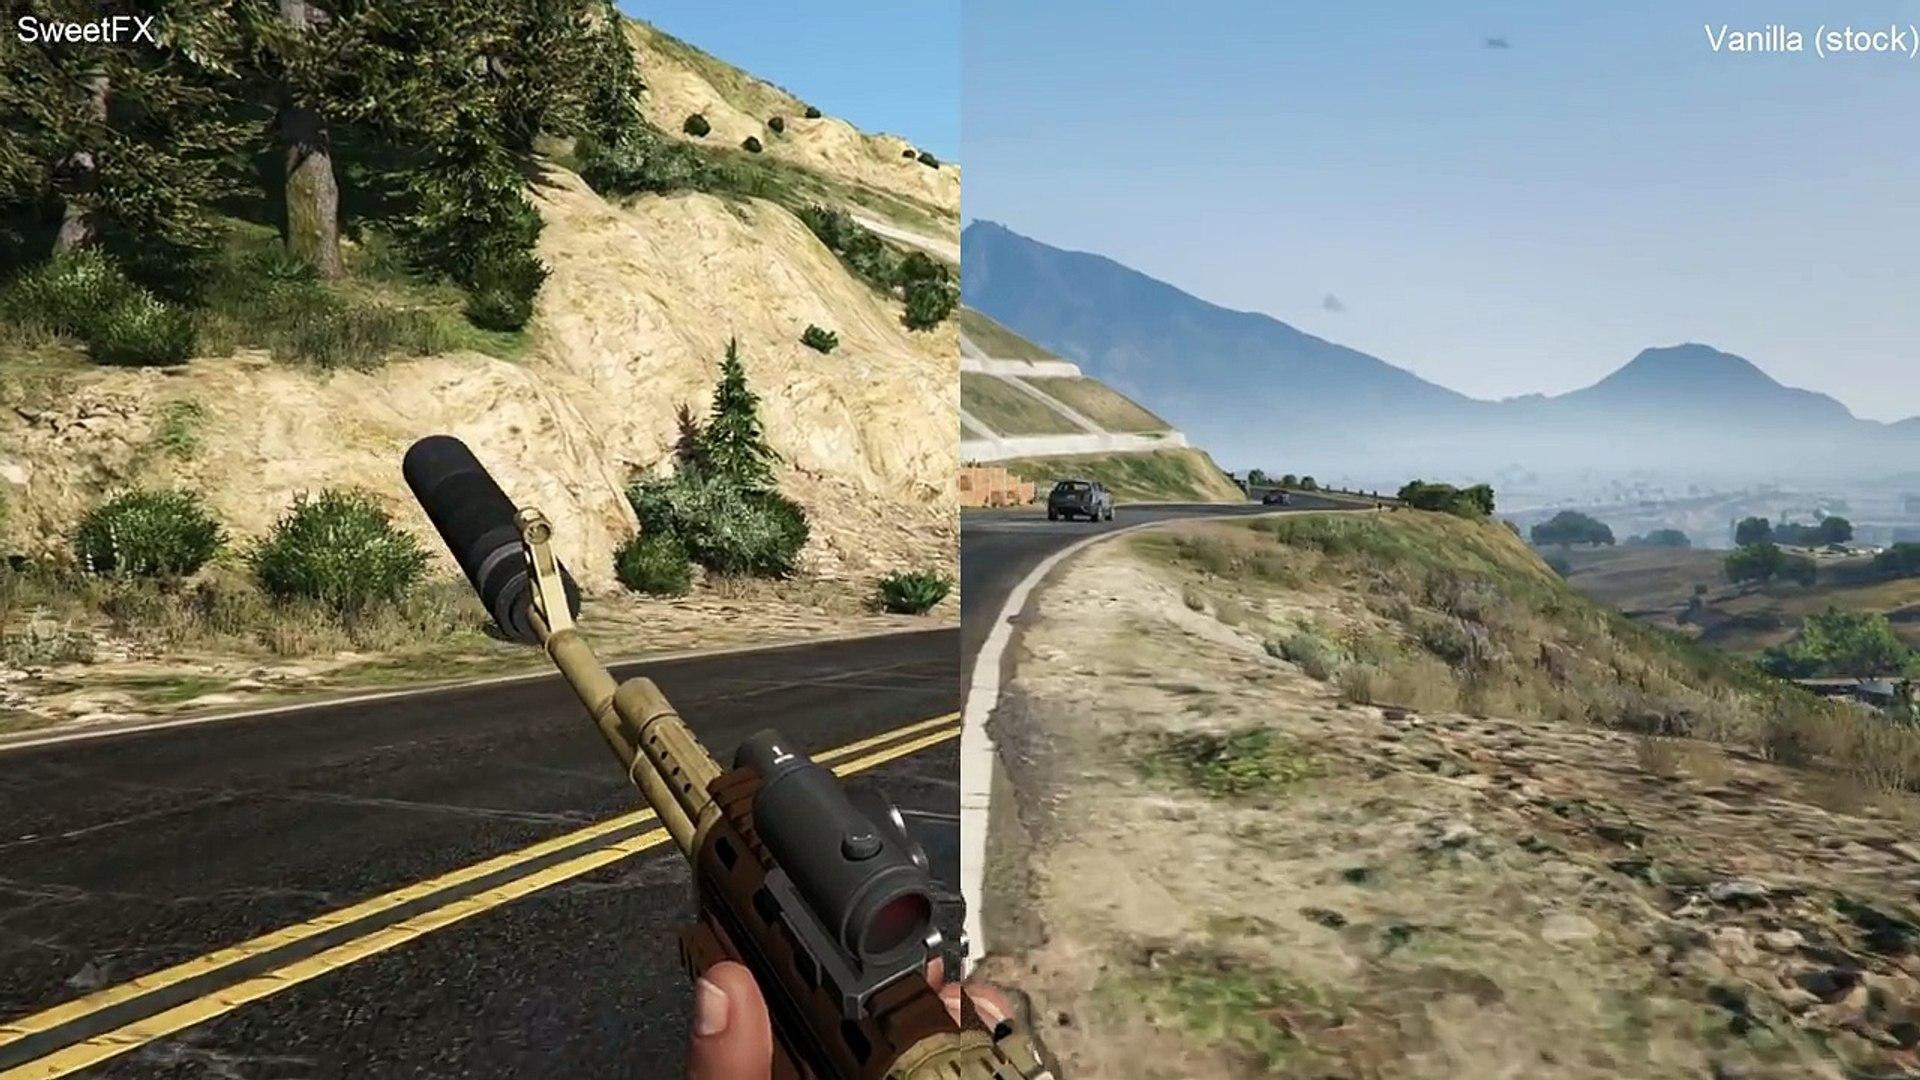 GTA 5 PC Mods SweetFX Graphics Mod Compare HD